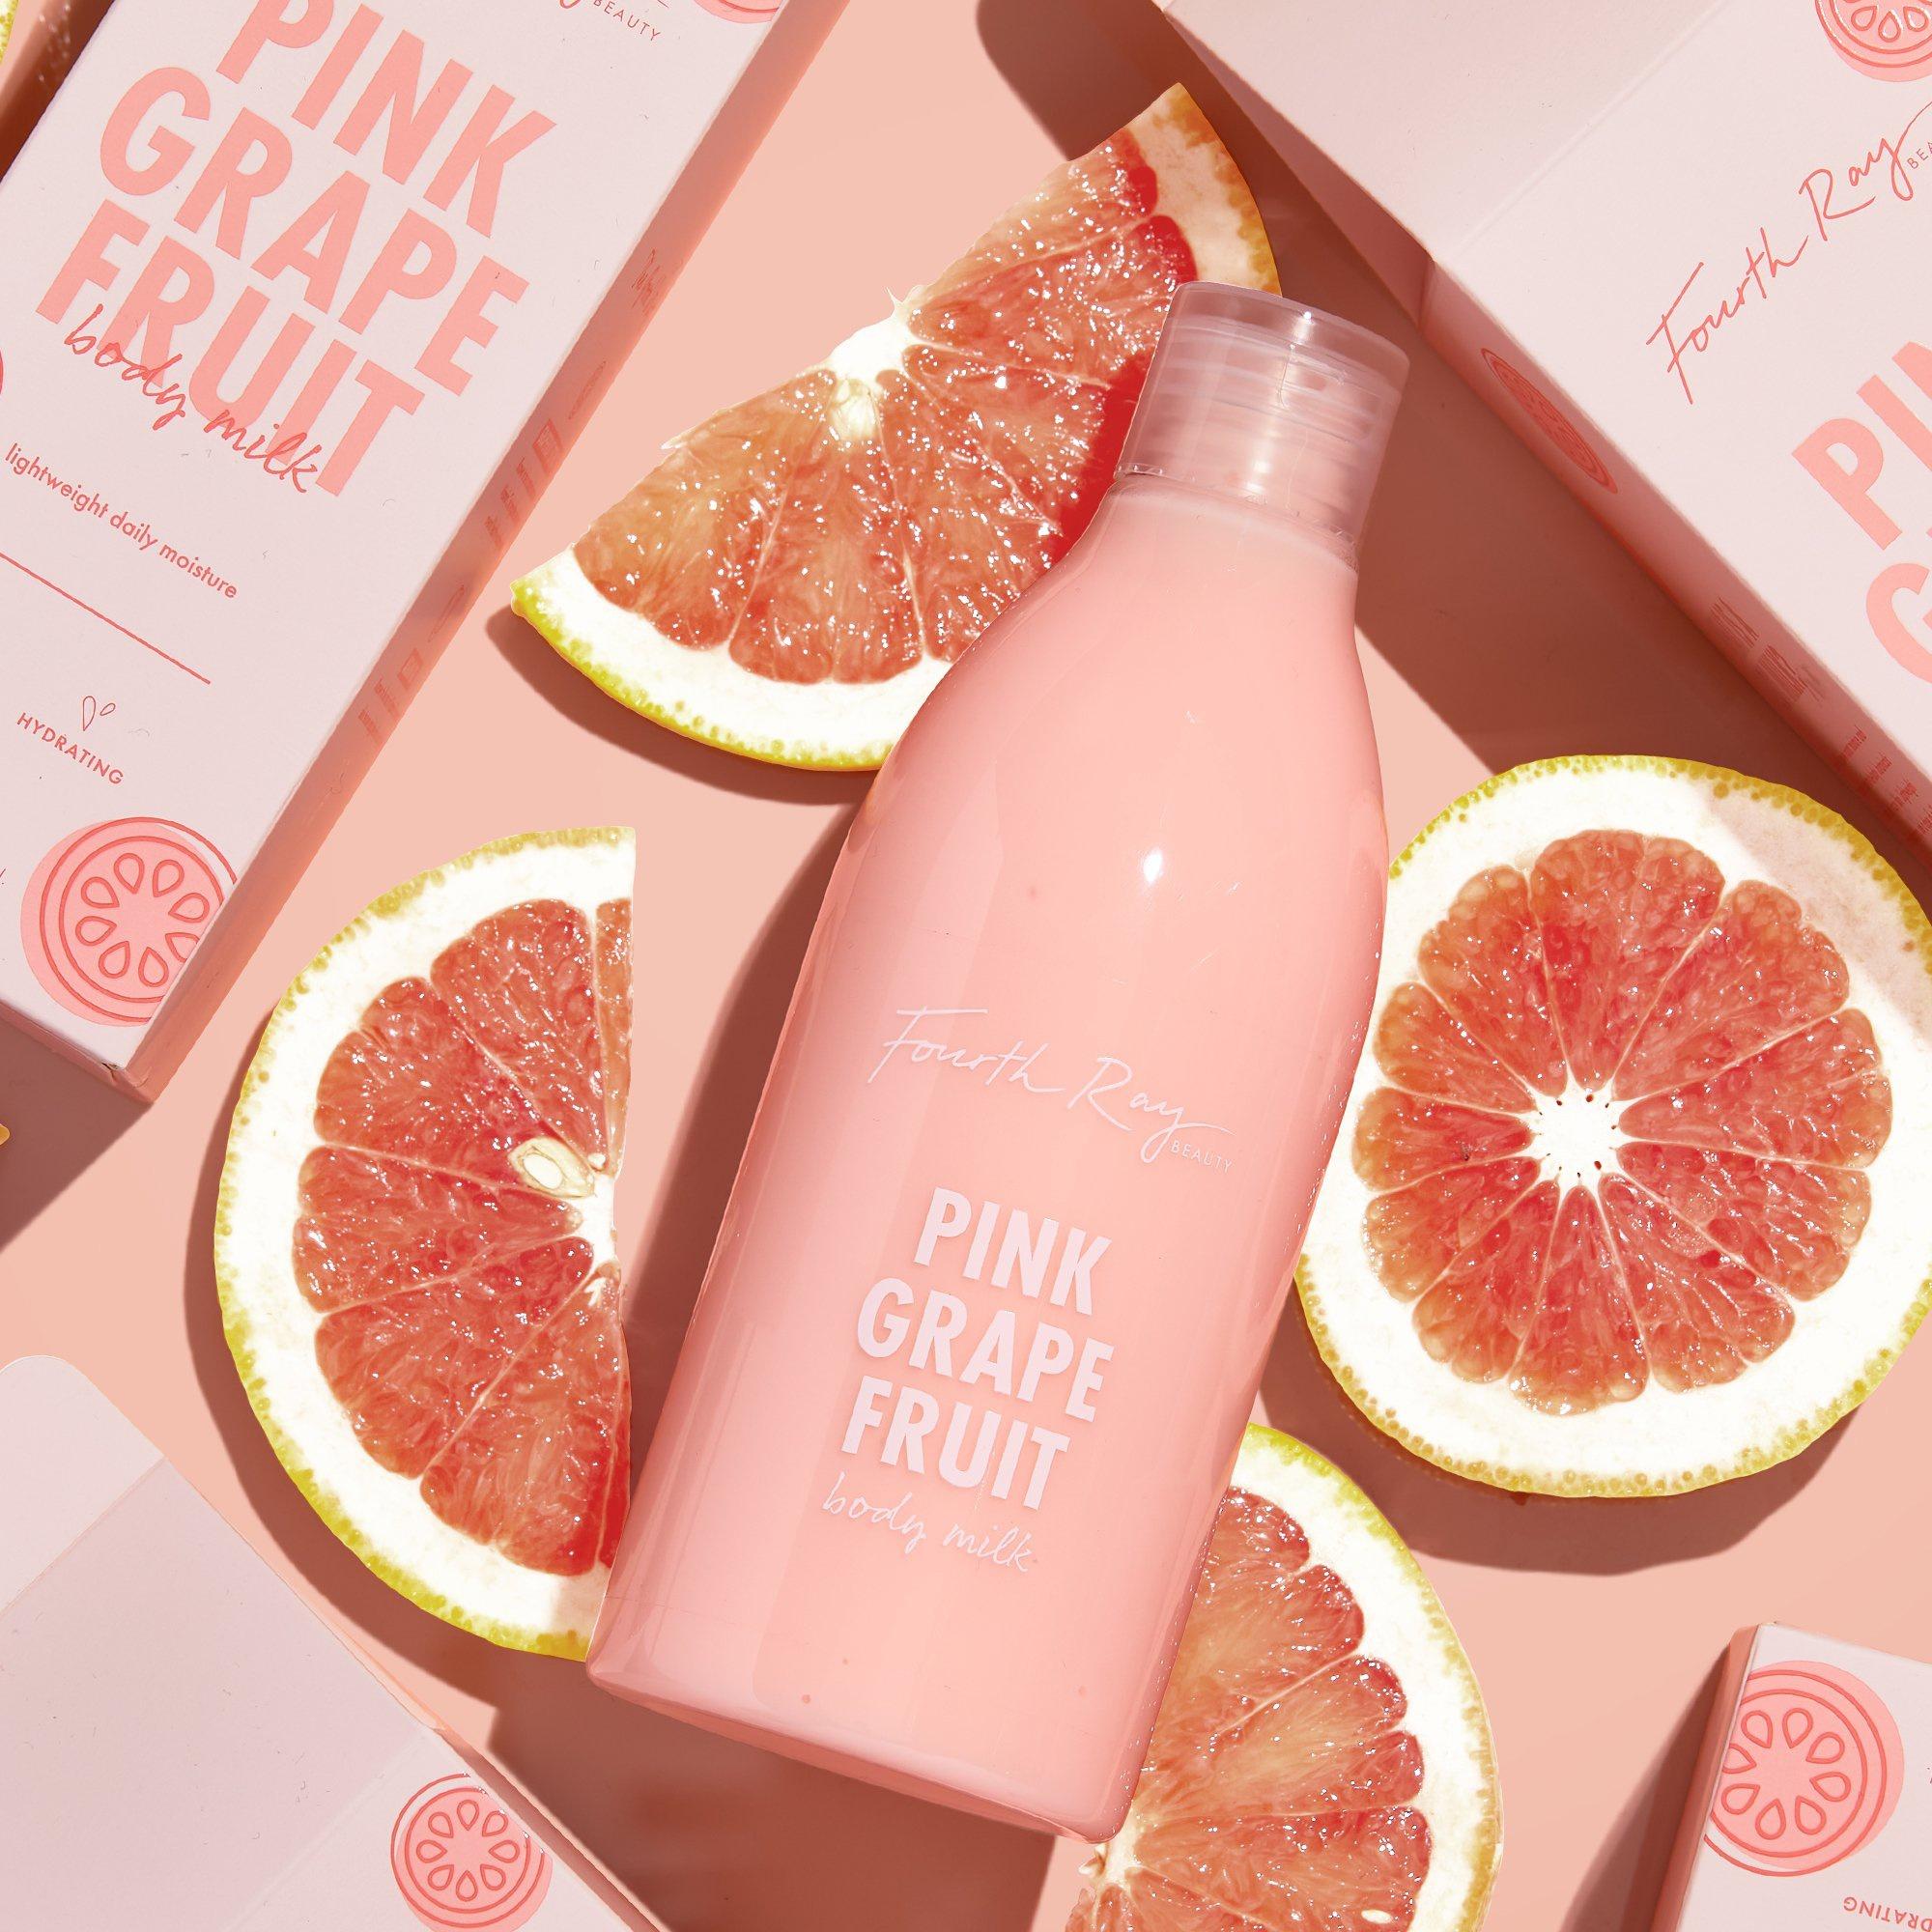 Fourth Ray Pink Grapefruit Brightening Body Milk